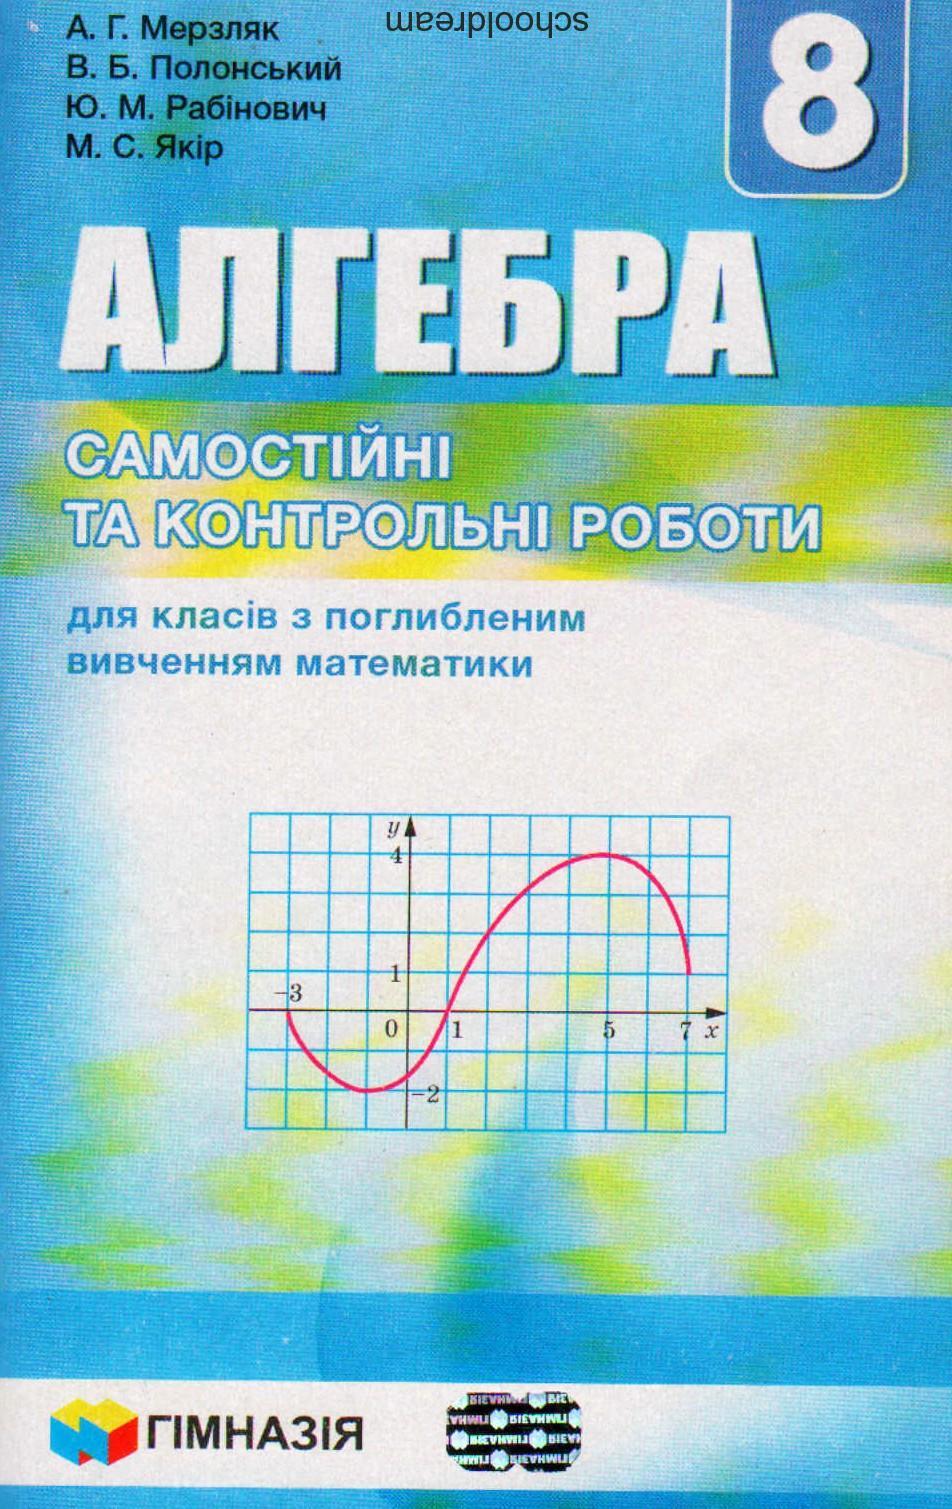 Гдз з алгебр 8 клас мерзляк